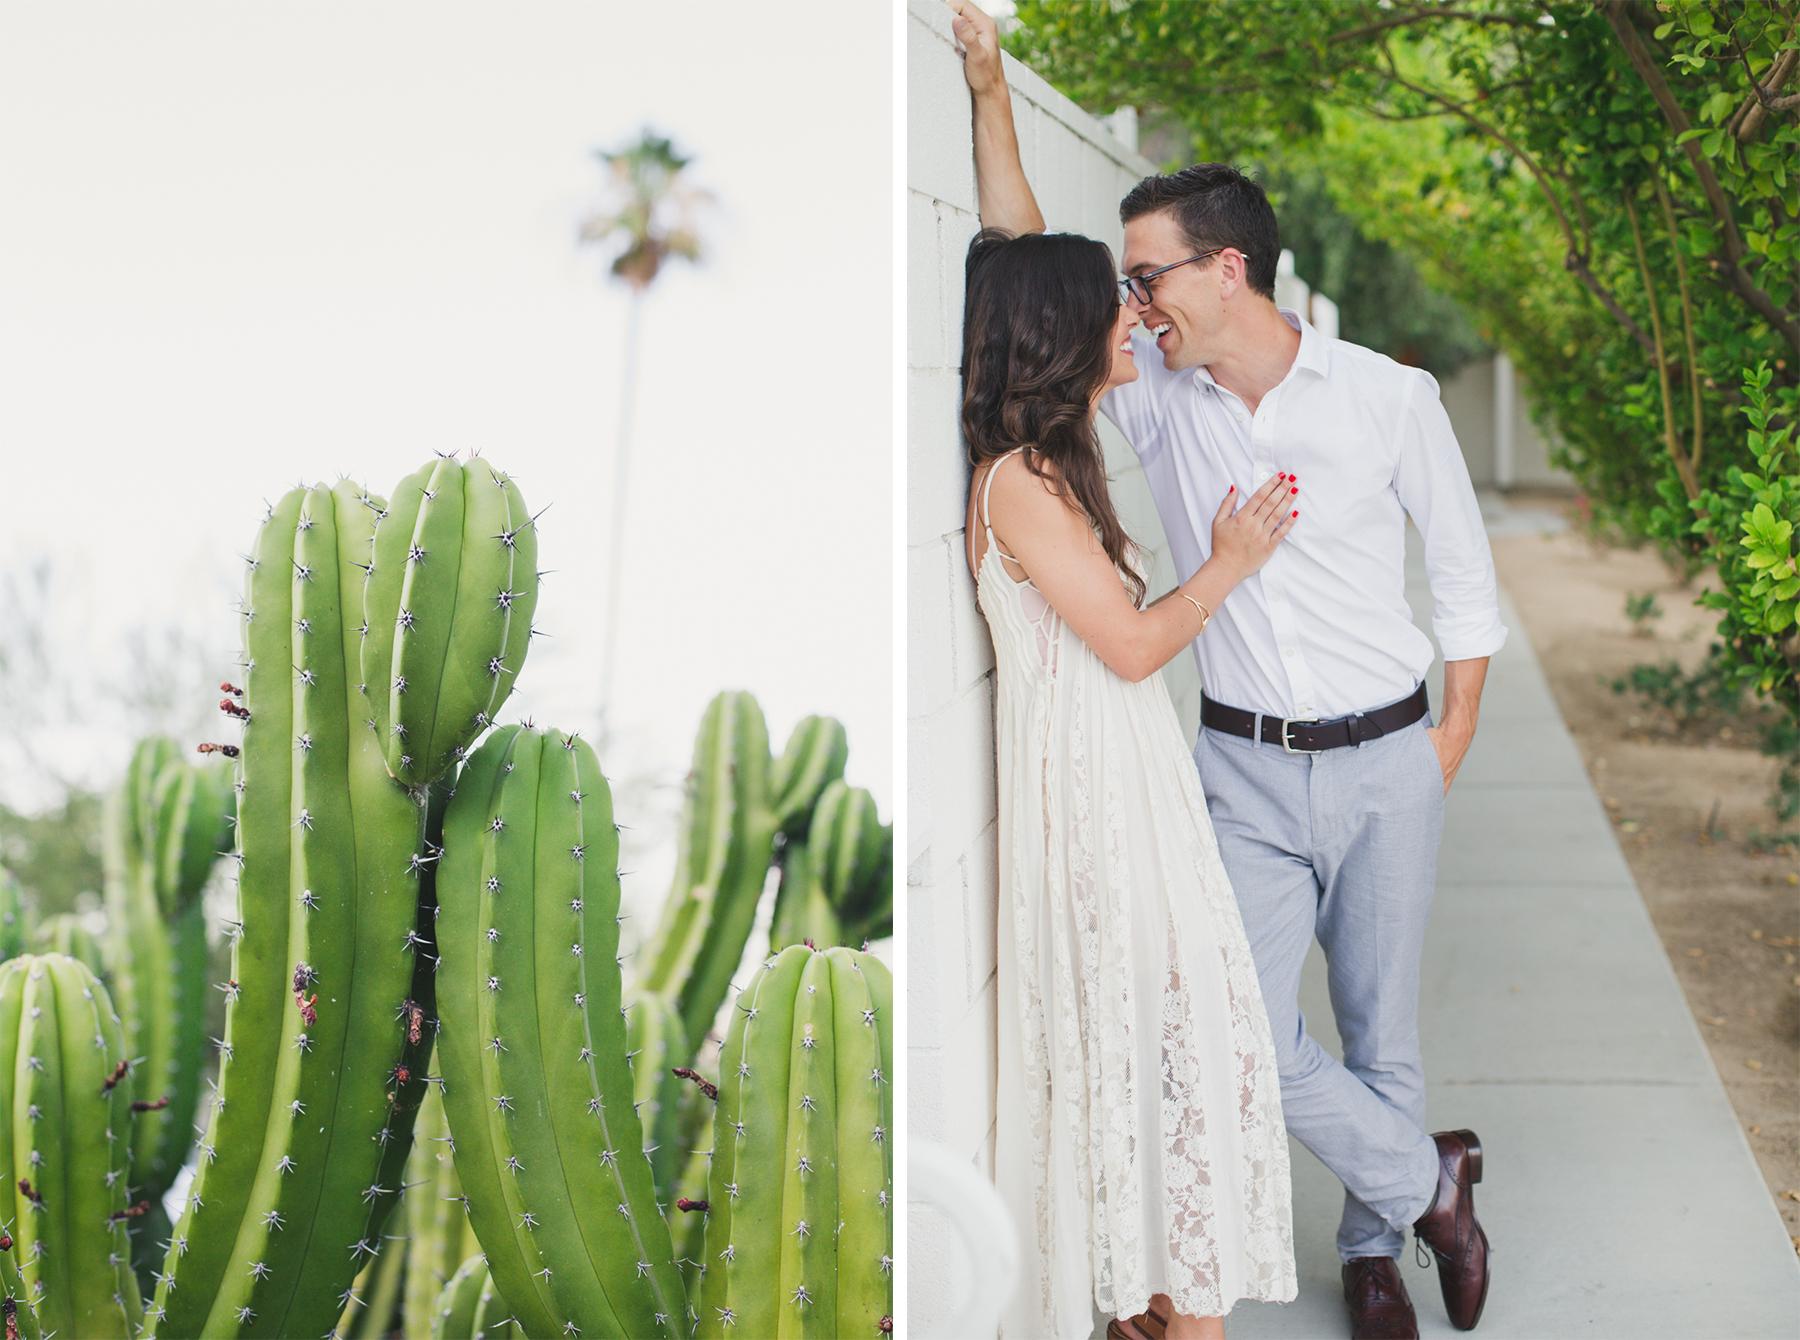 cactus2up.jpg